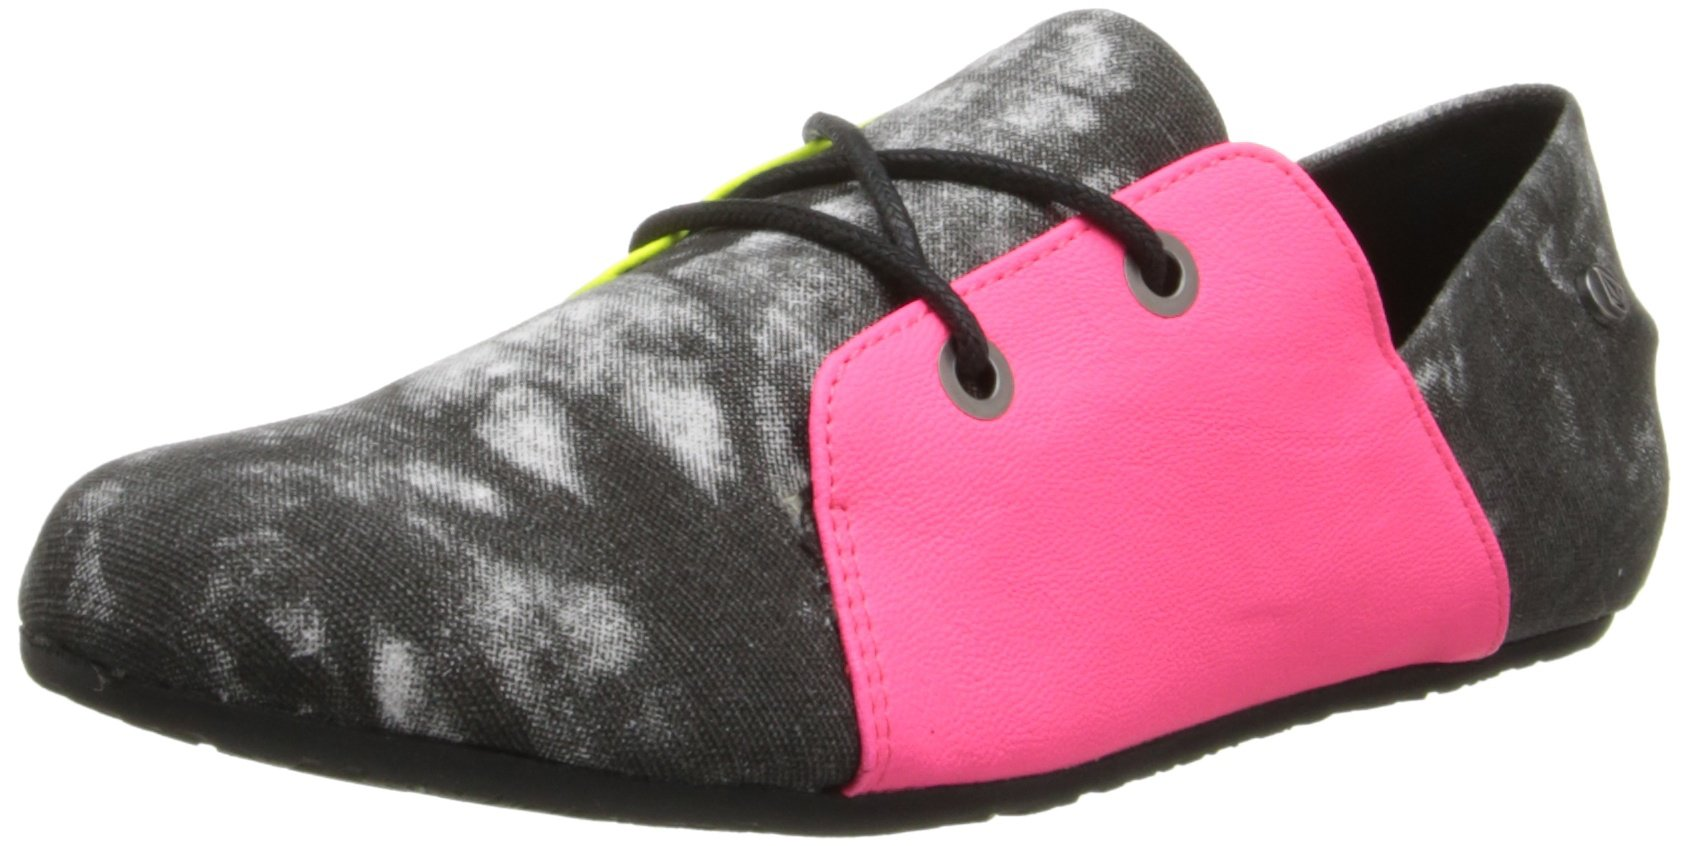 Volcom Women's Soul Mates Fashion Sneaker,Acid Grey,5.5 M US by Volcom